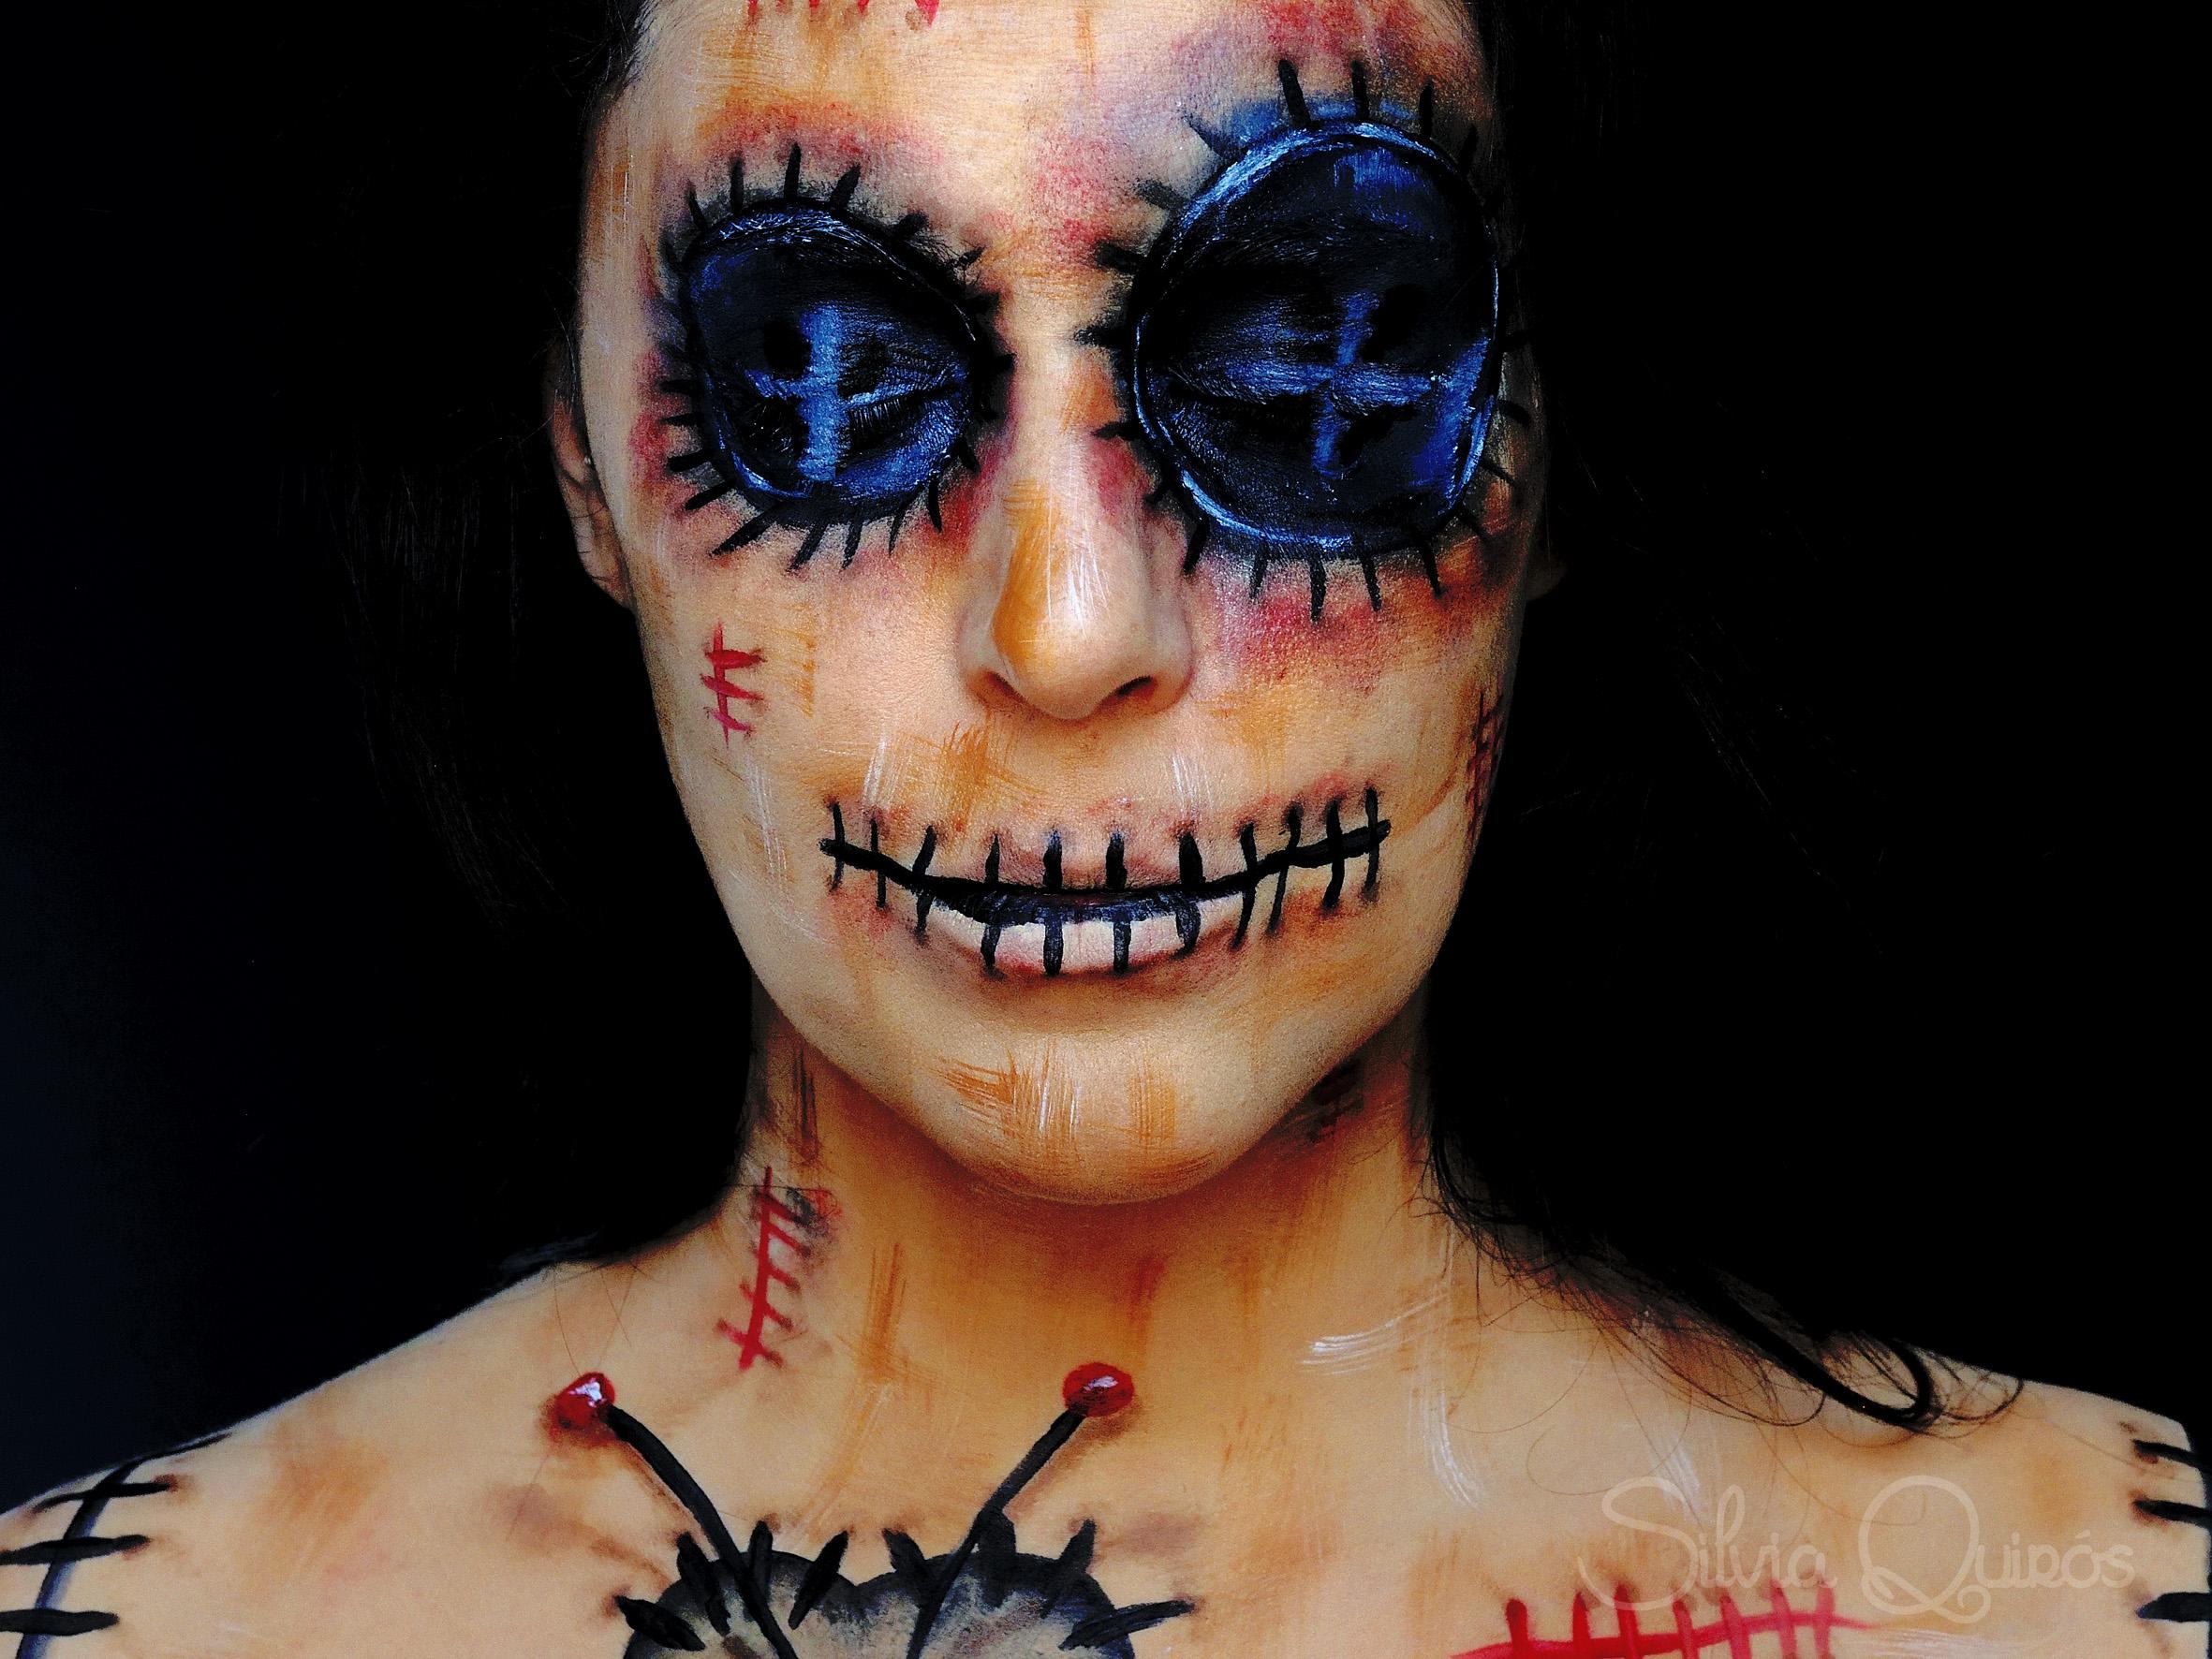 Tutorial maquillaje mueca Vud Silvia Quirs